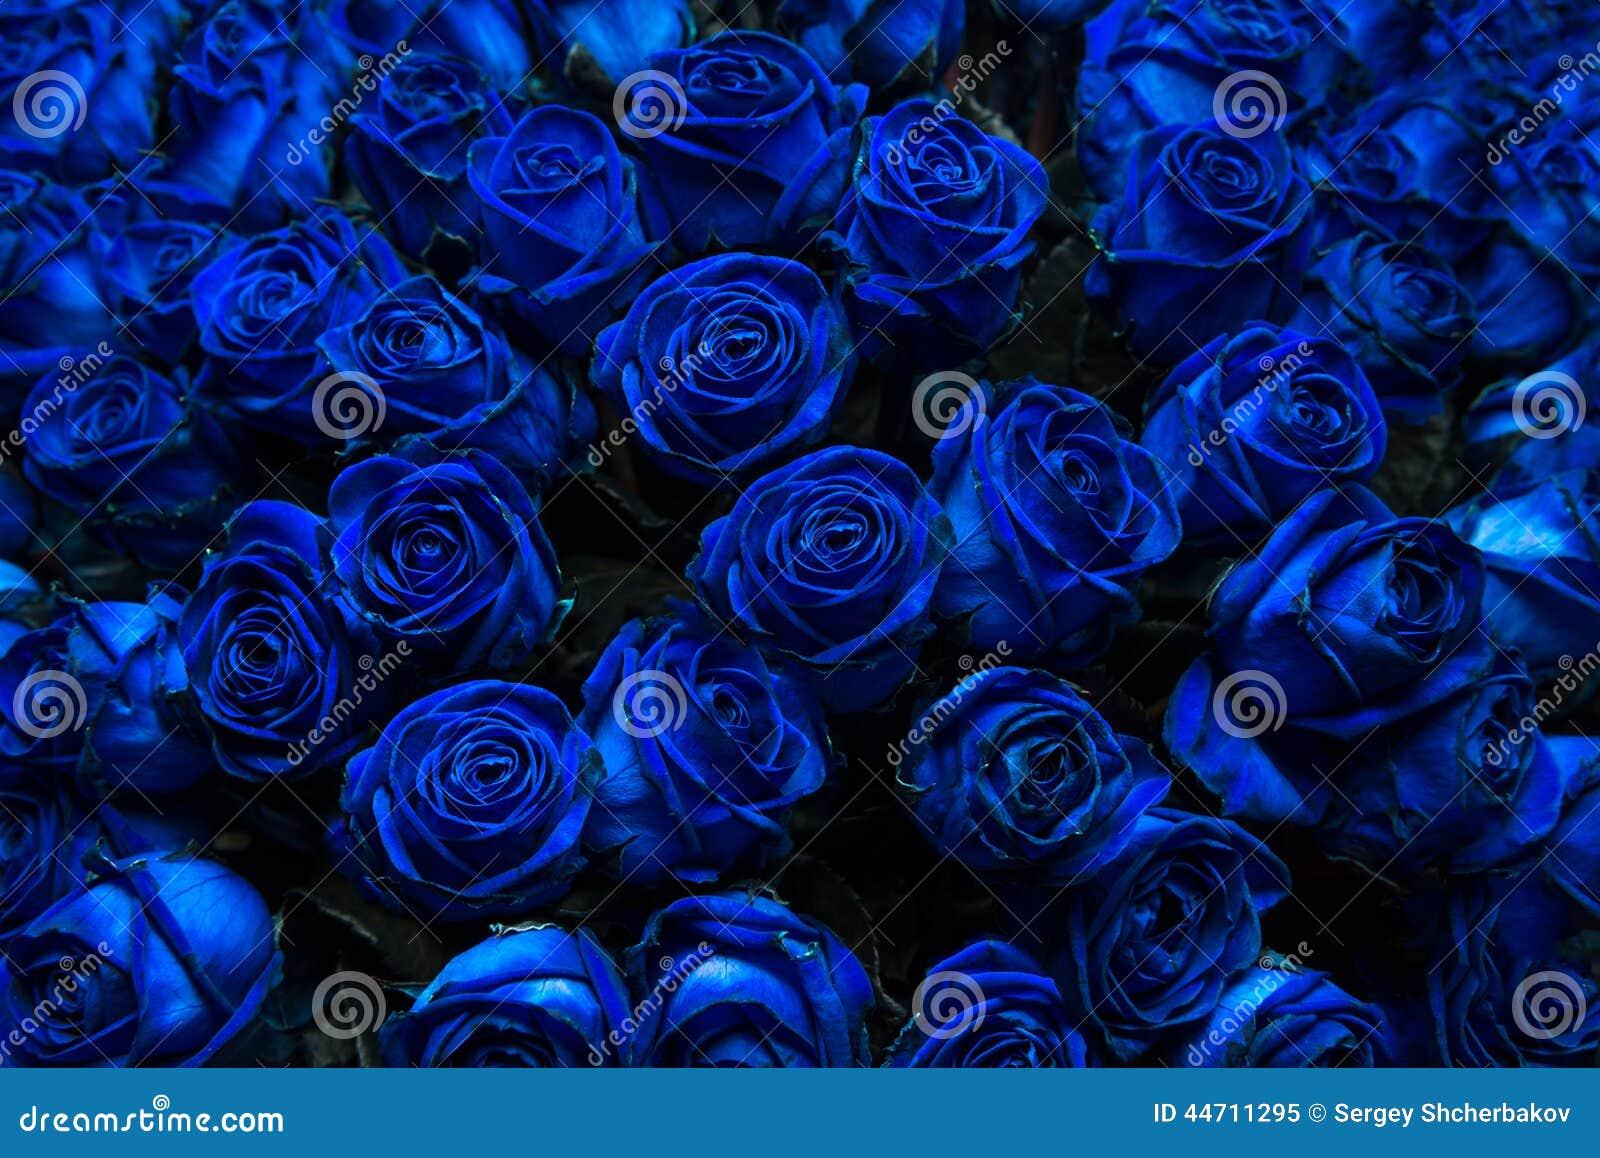 Rosas Azules Imagen De Archivo Imagen De Corte Flora 44711295